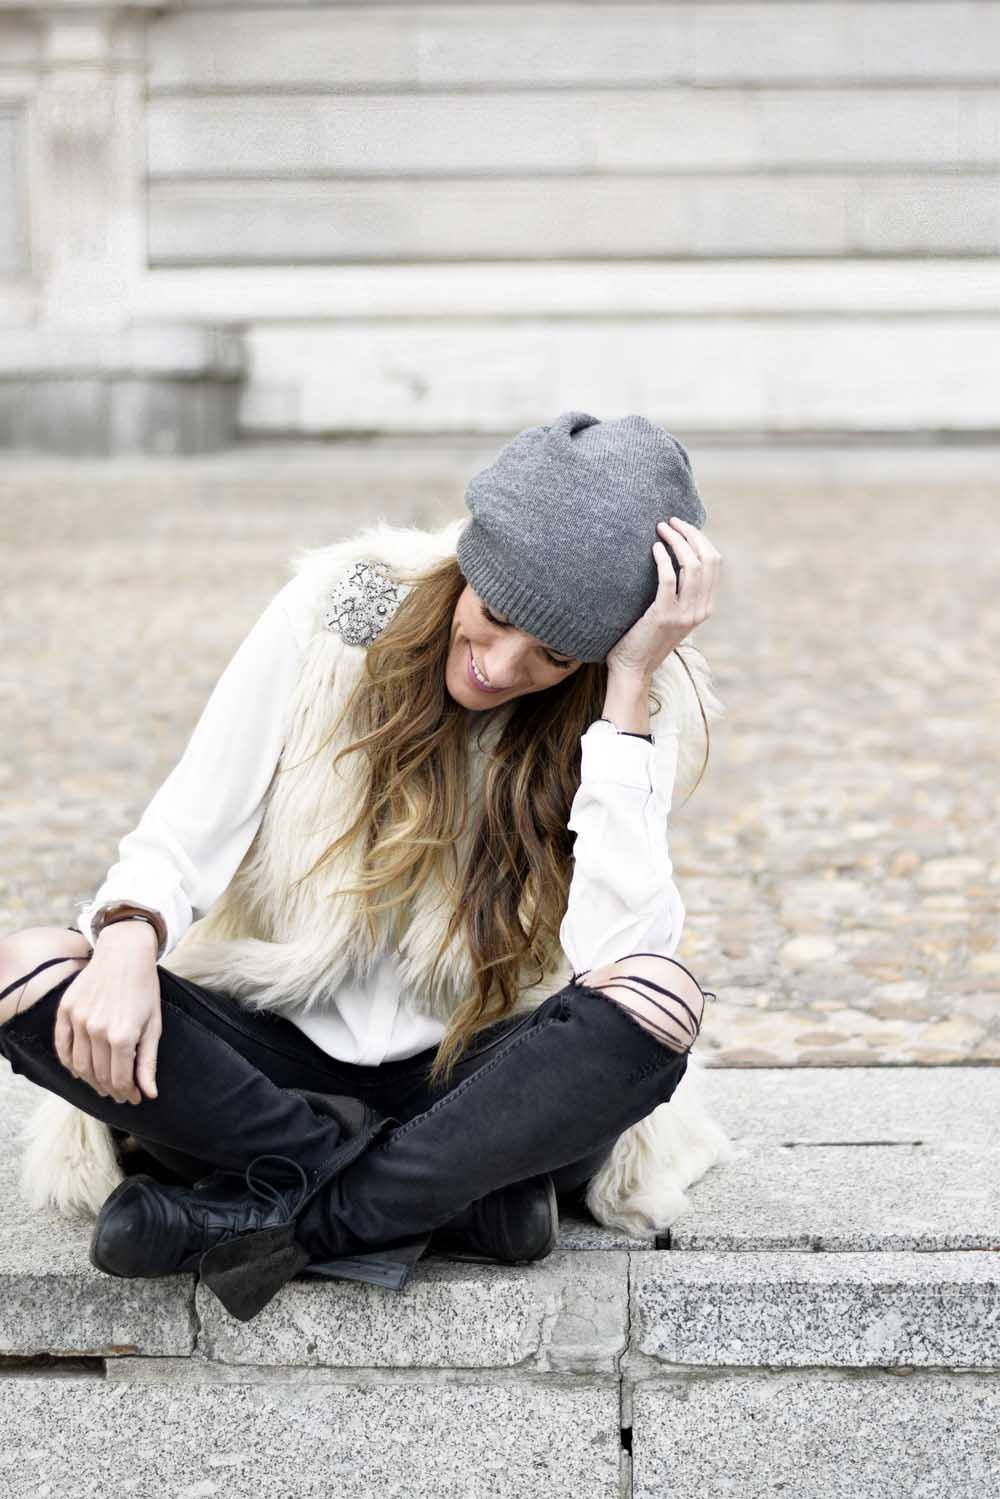 Pantalones – jeans – H M (fw 2015-2016) Camisa – shirt – Mango (old) Botas  – boots – Zara (old) Gorro – beanie – H M Man Reloj – watch – ClUSE (here) ebbefe53fb0